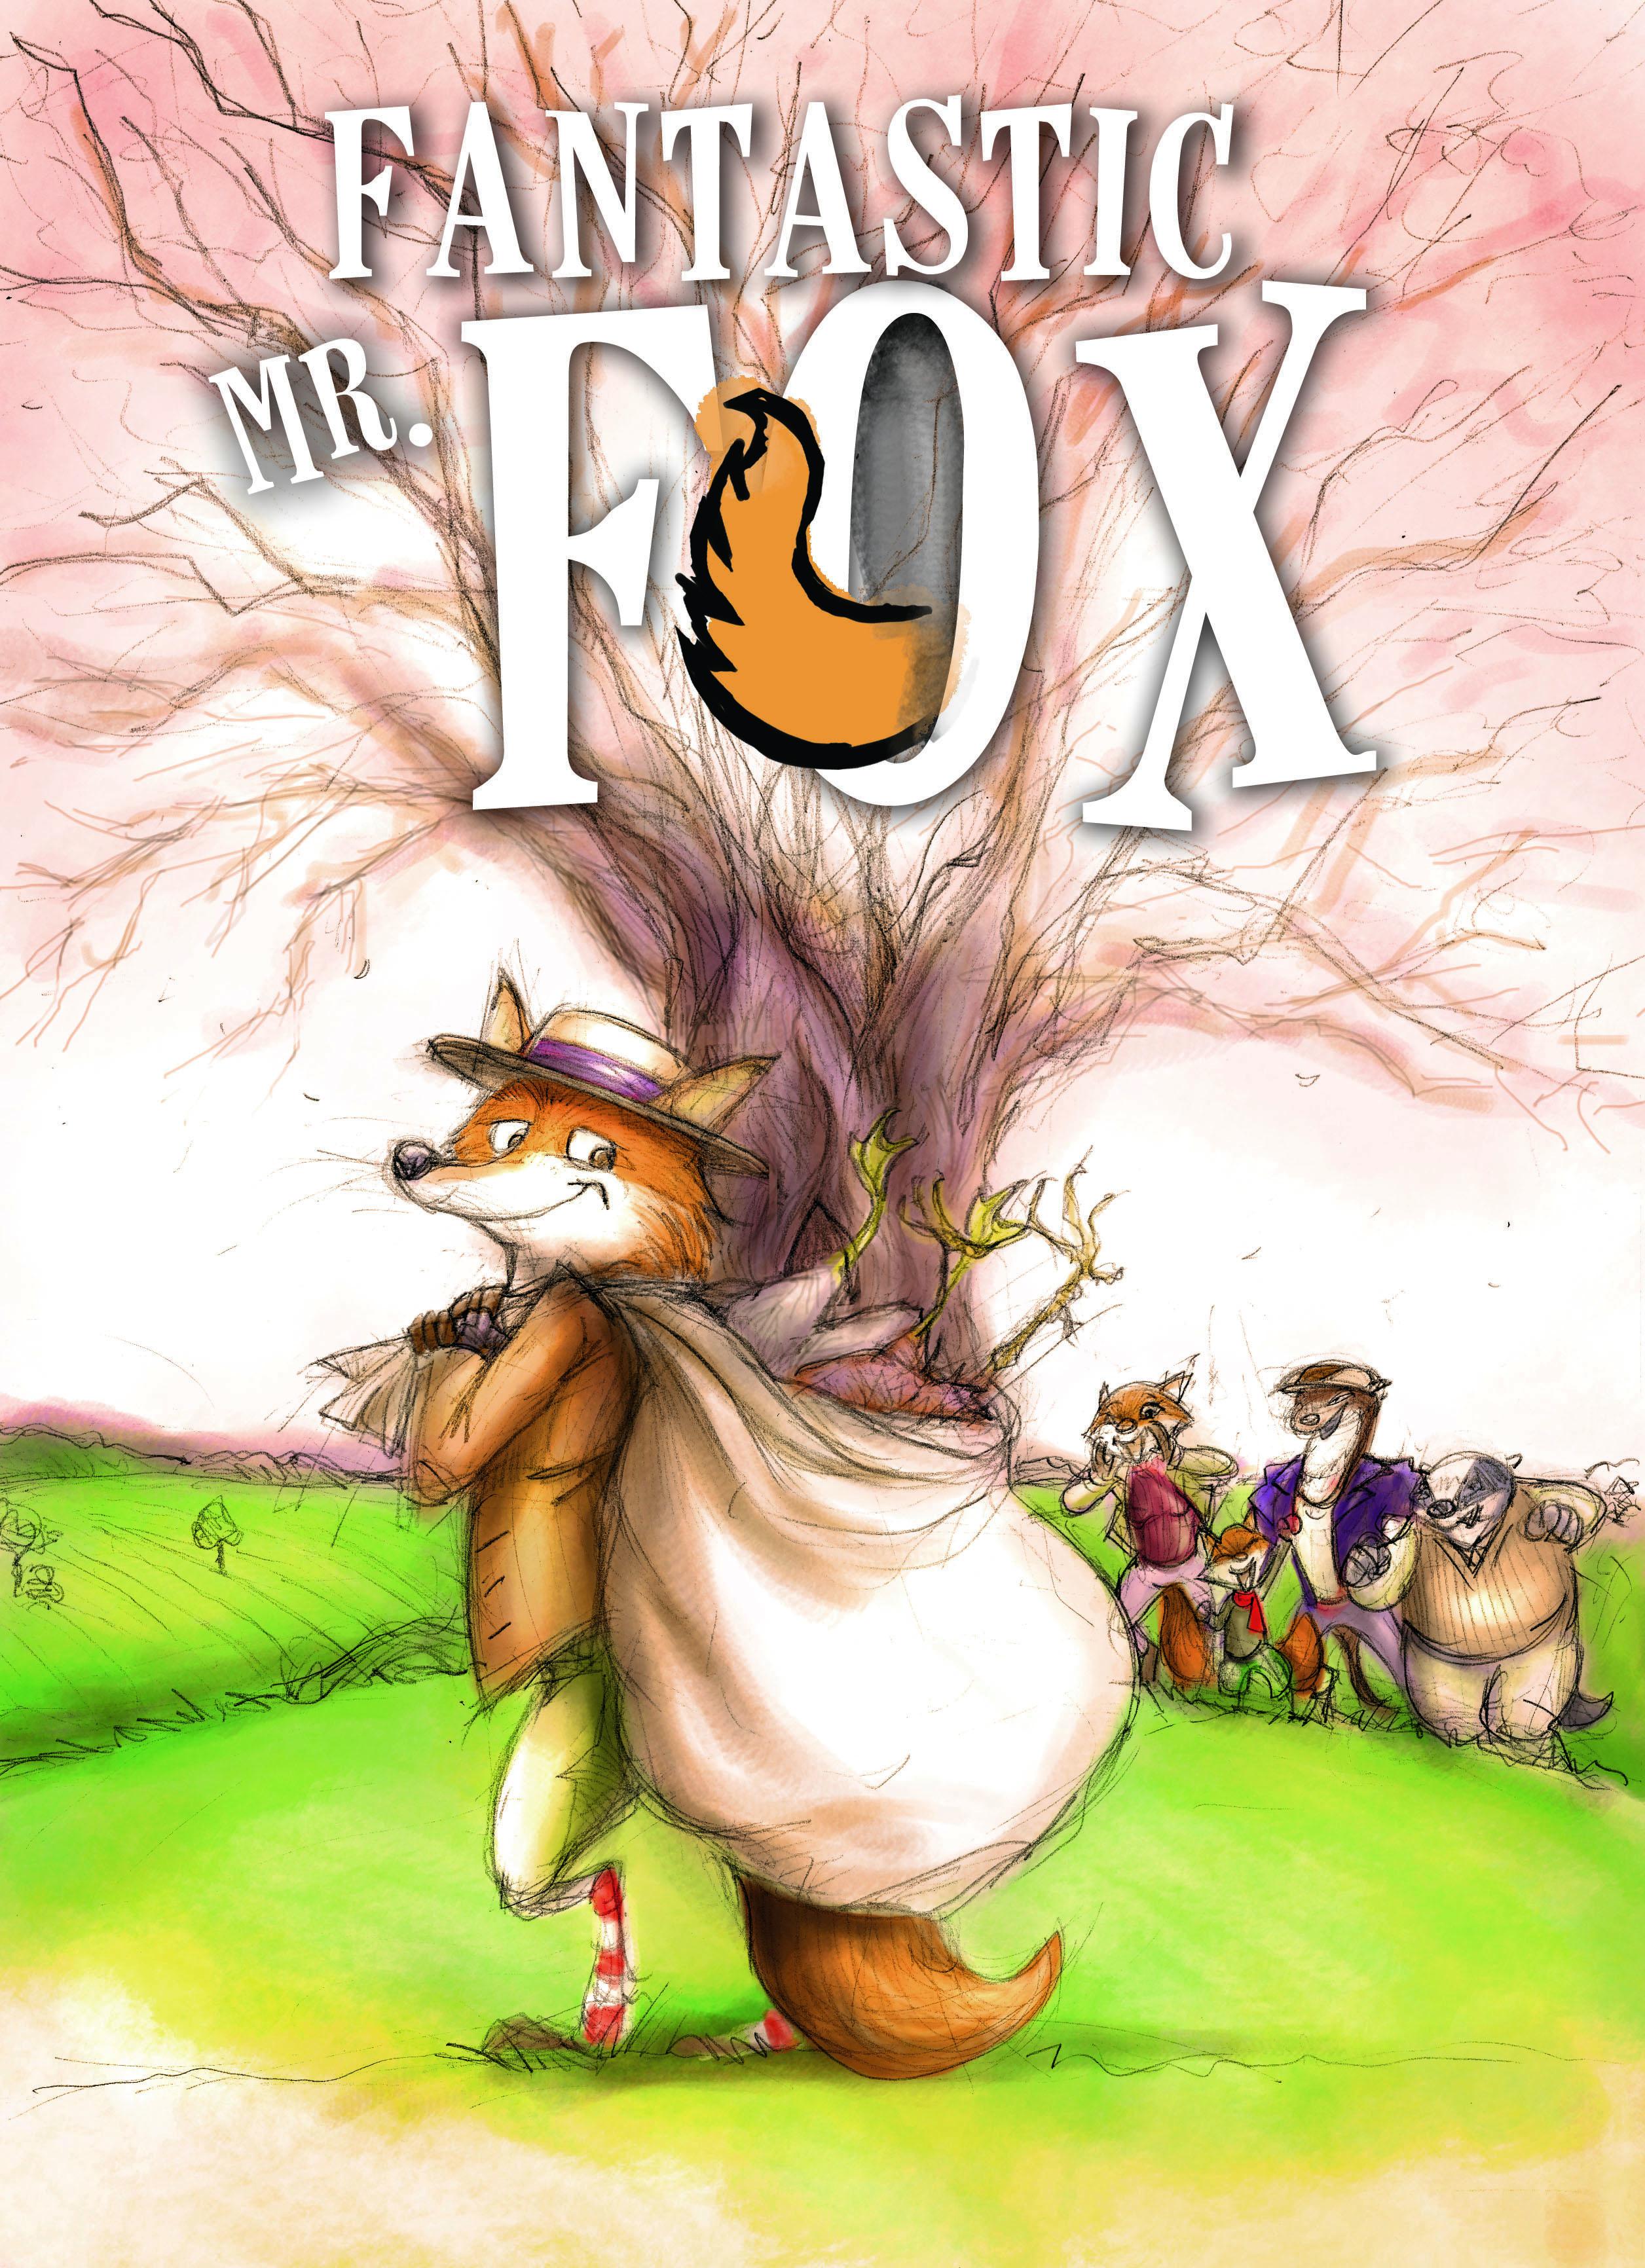 Fantastic Mr Fox Cerealbox Studios